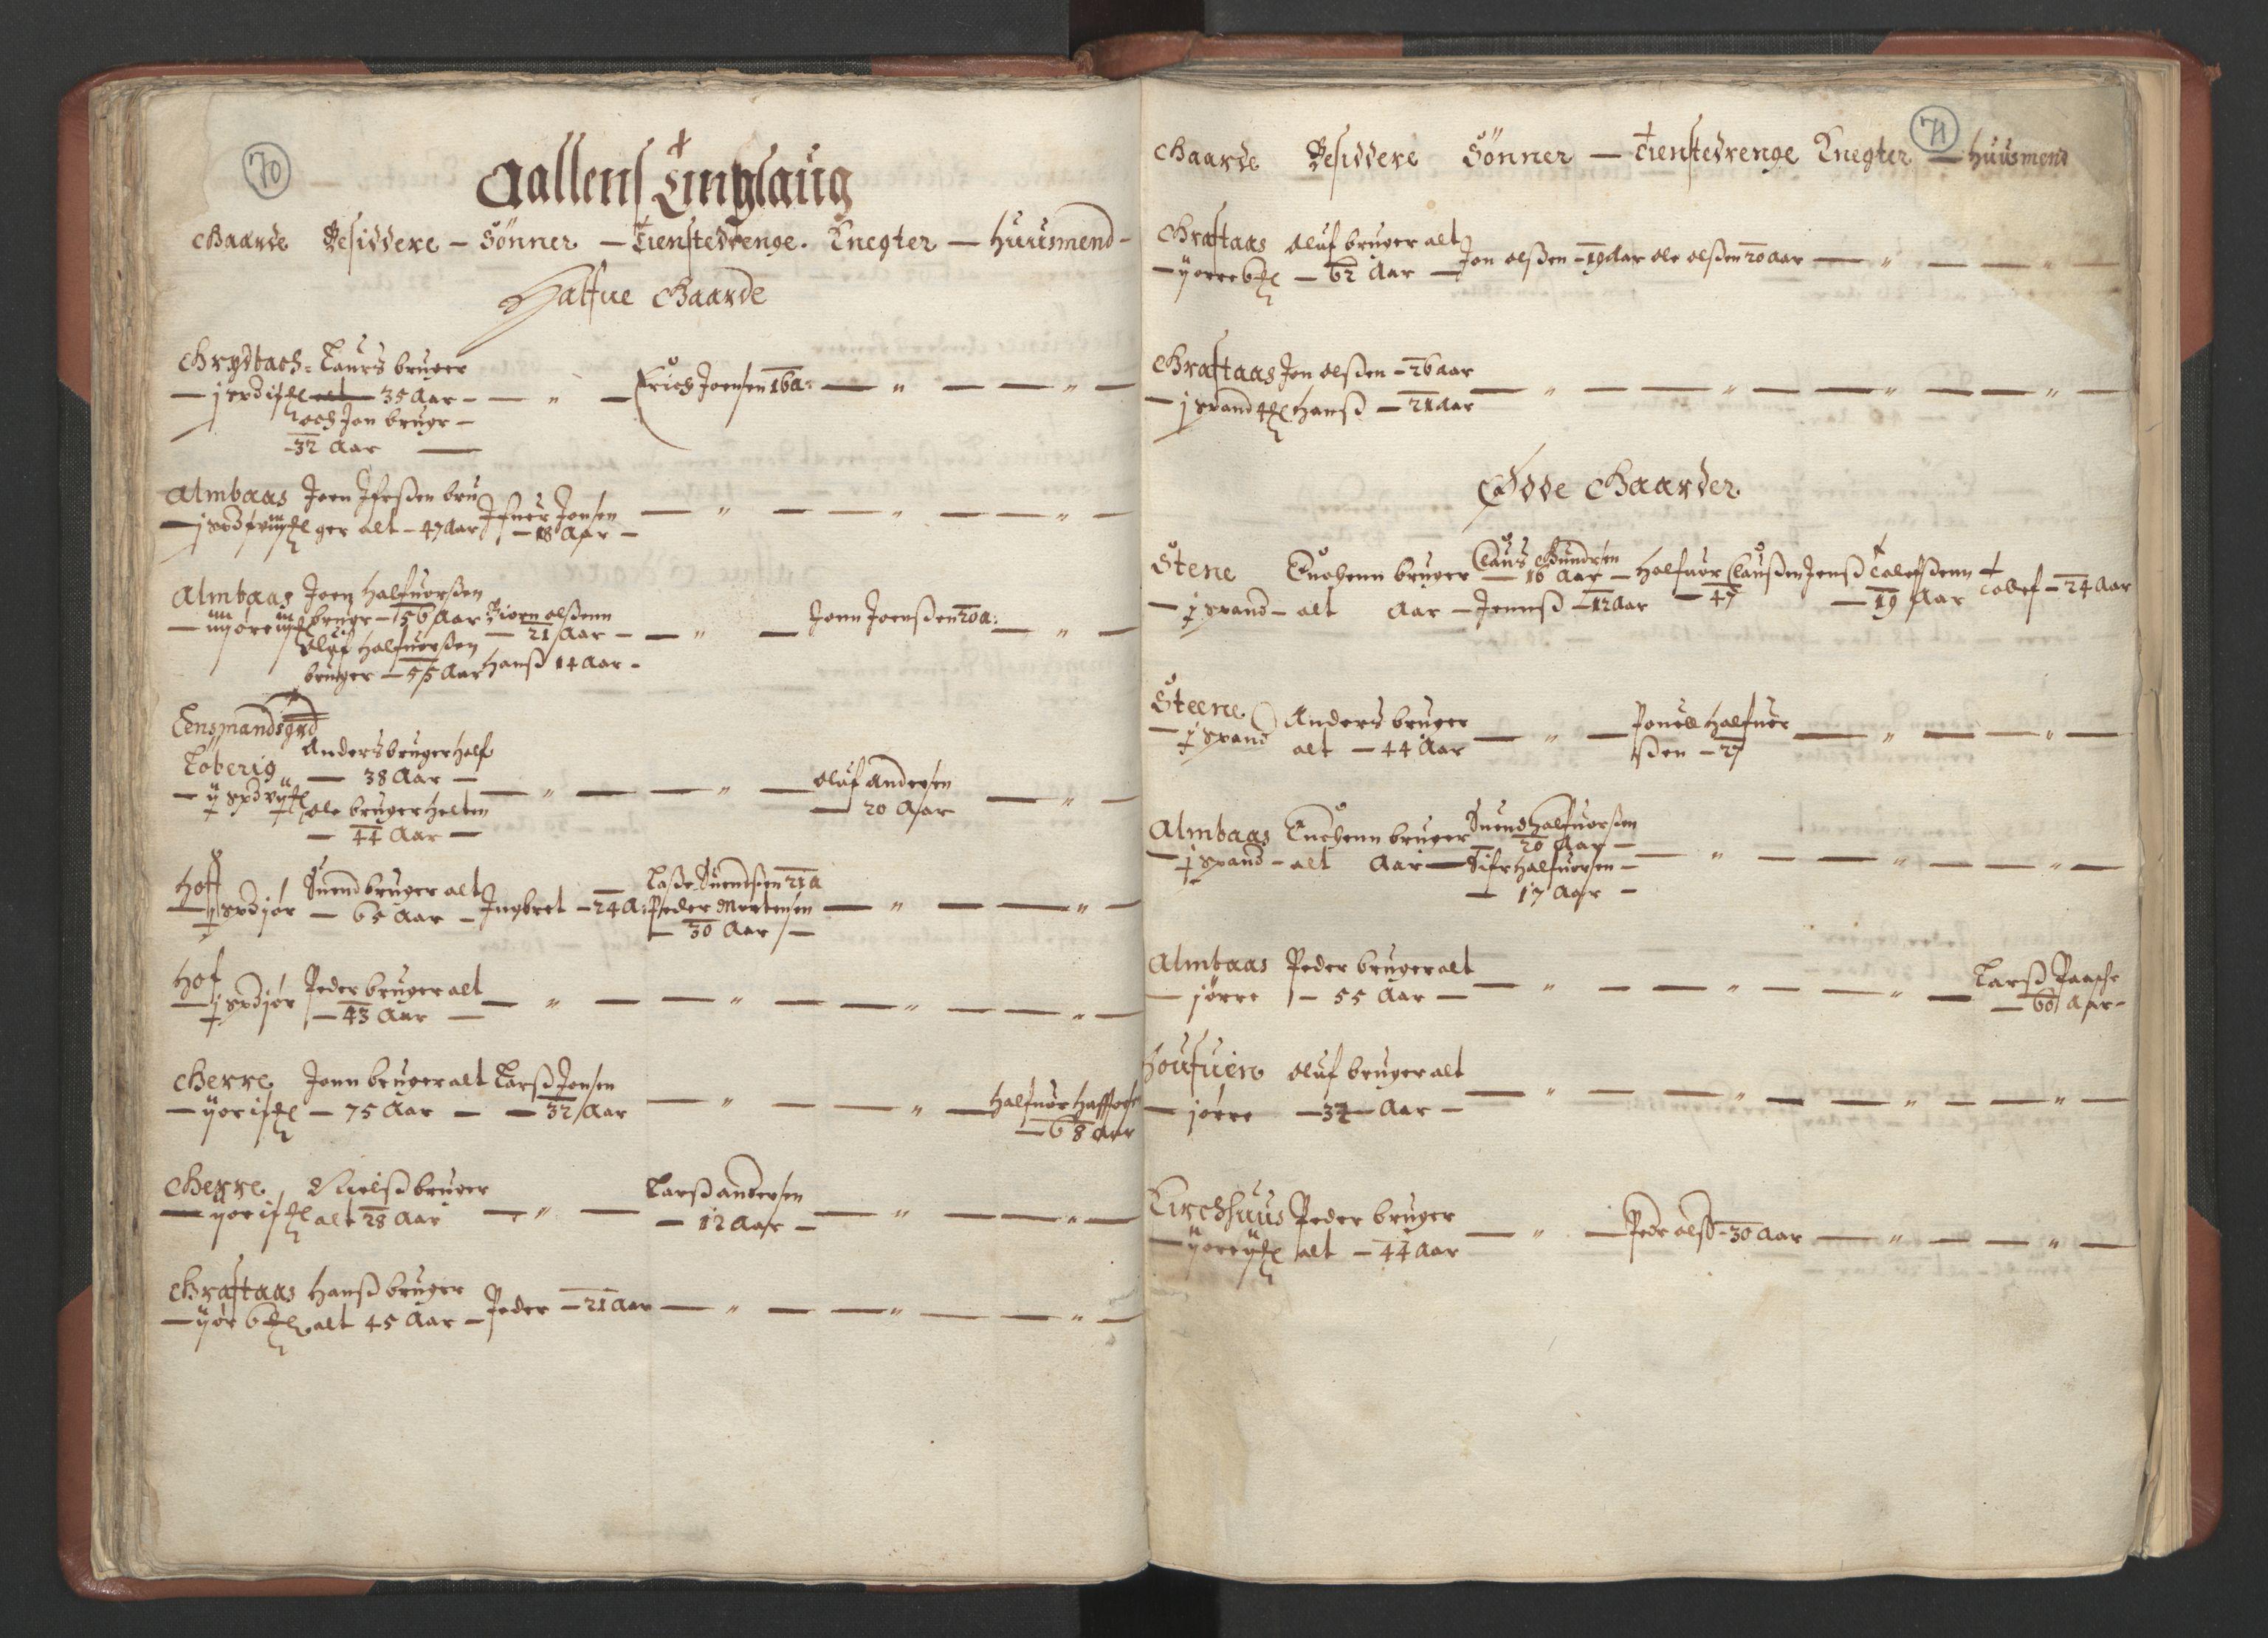 RA, Fogdenes og sorenskrivernes manntall 1664-1666, nr. 18: Gauldal fogderi, Strinda fogderi og Orkdal fogderi, 1664, s. 70-71